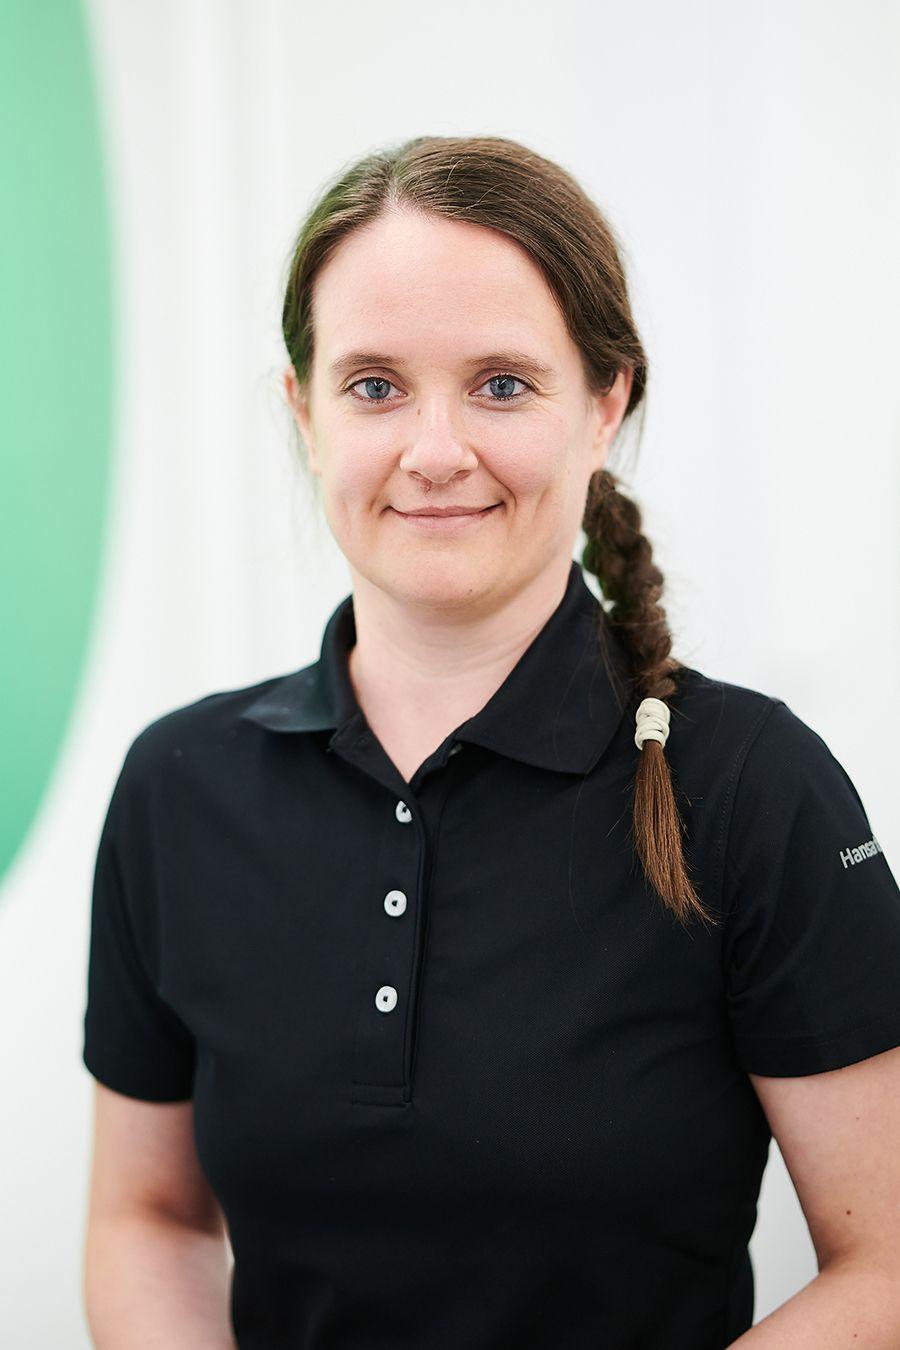 Maria Neuner